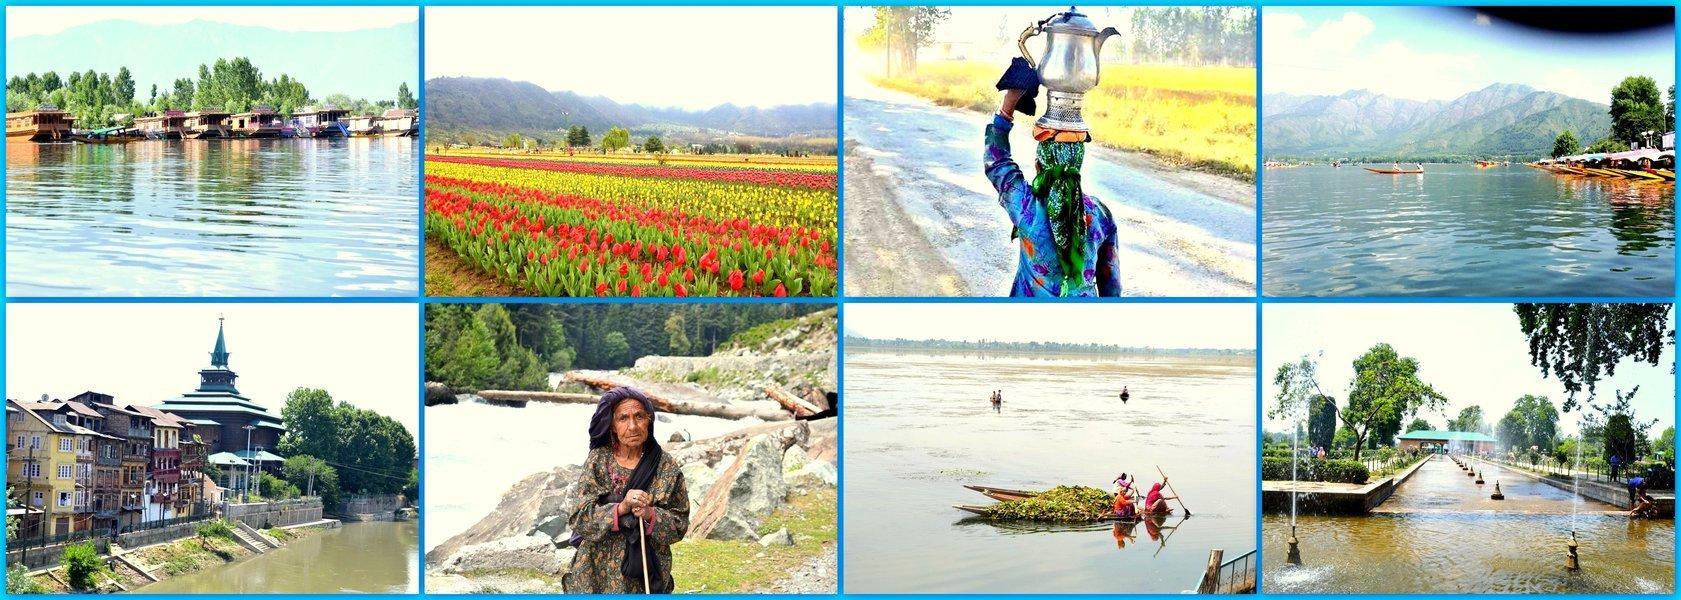 Kashmir Four Seasons - Tour